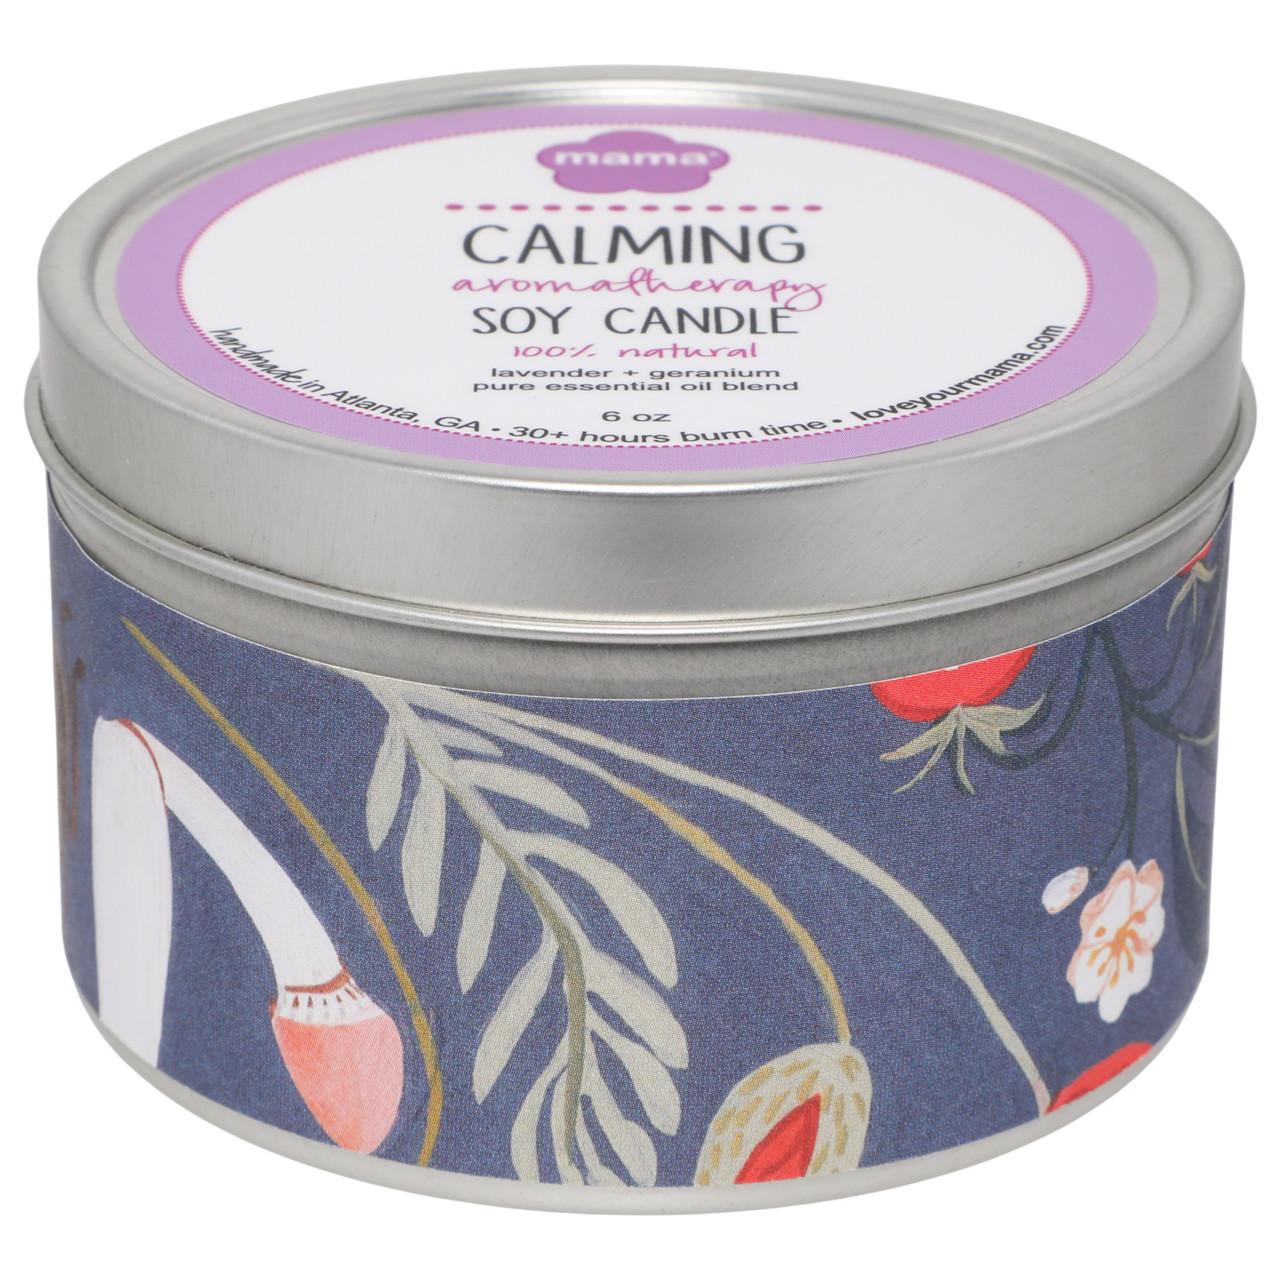 Lavender + Geranium (Calming) 6 oz. Soy Candle Tin | Mama Bath + Body